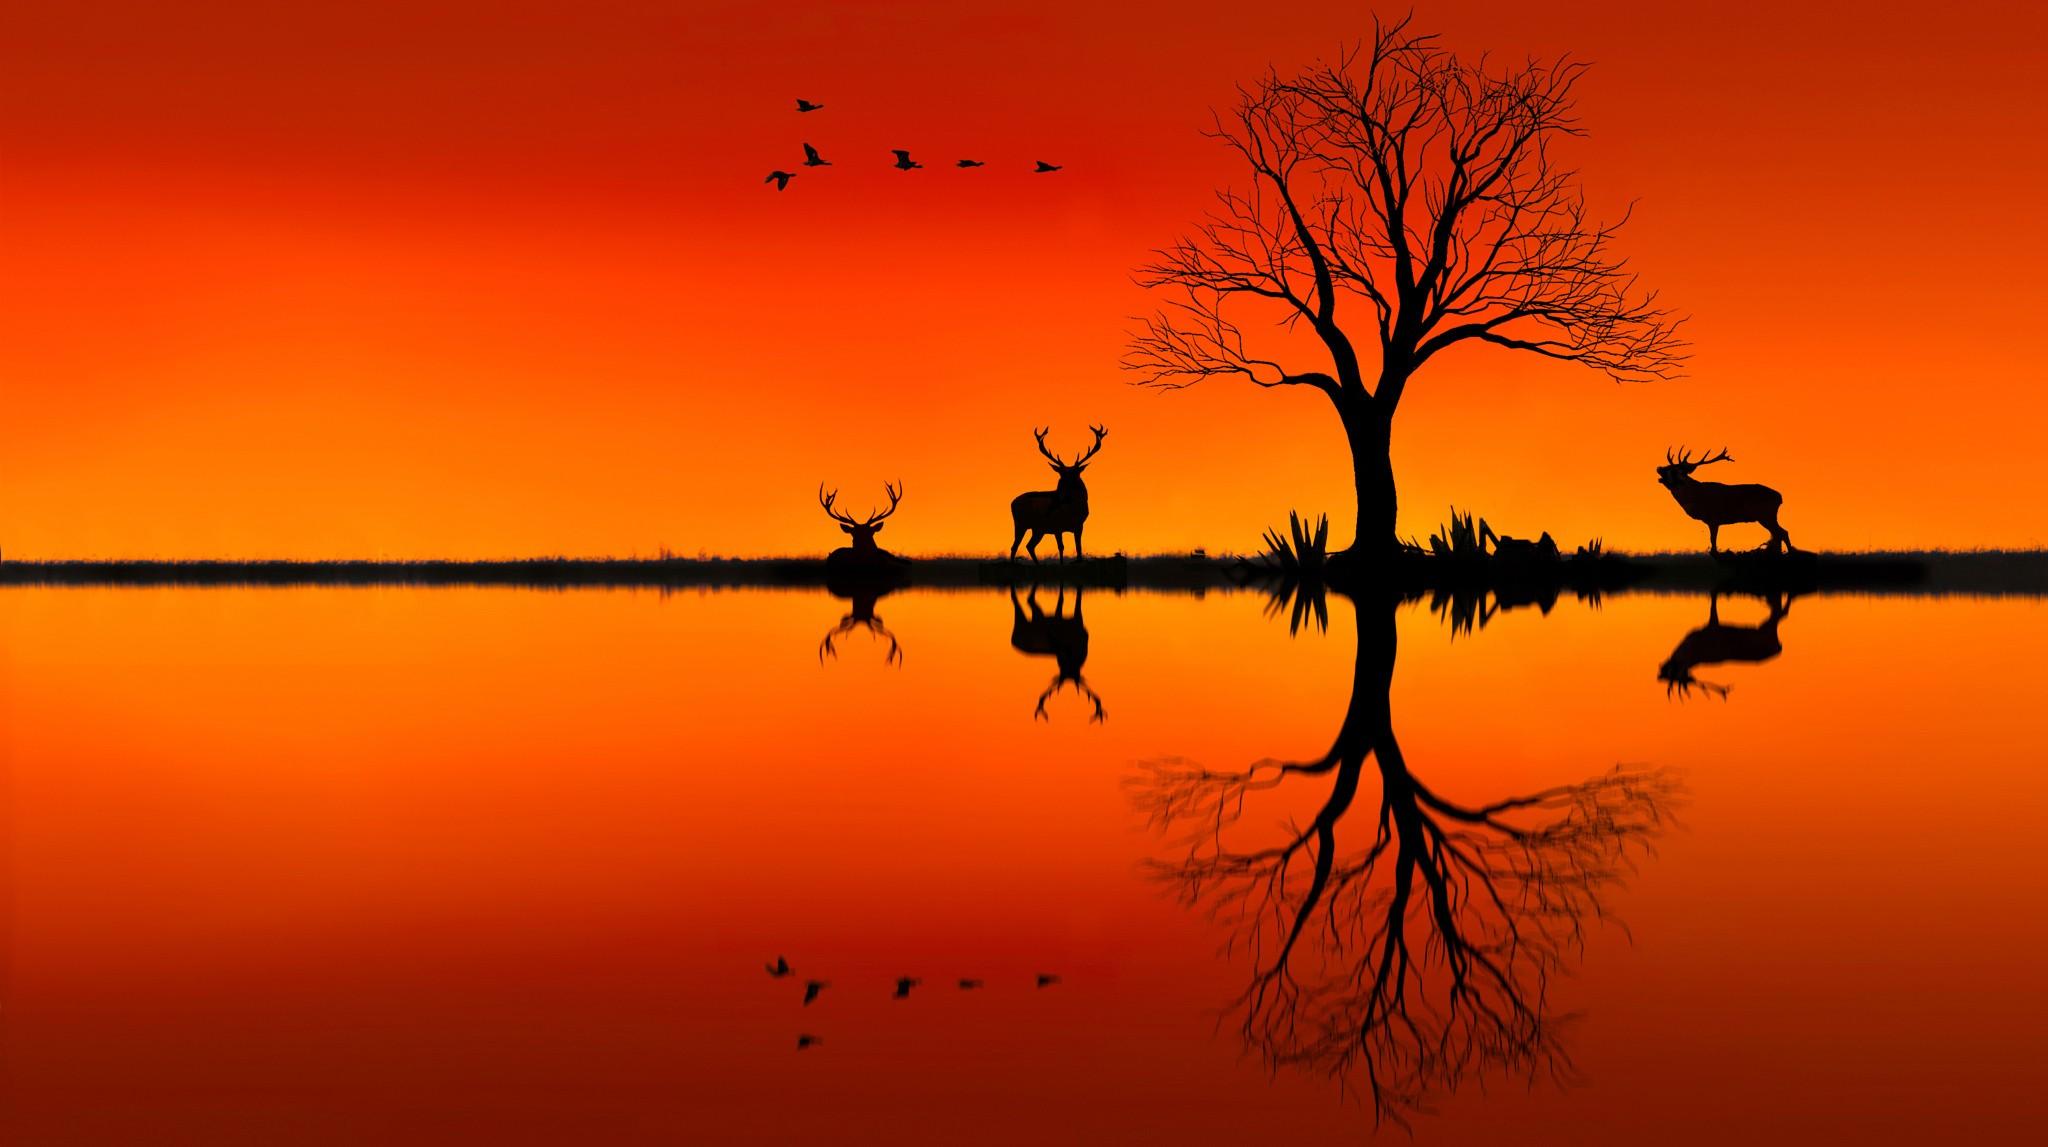 2048x1147 Elk On Horizon Sunset Evening, Hd Animals, 4k Wallpapers, Images